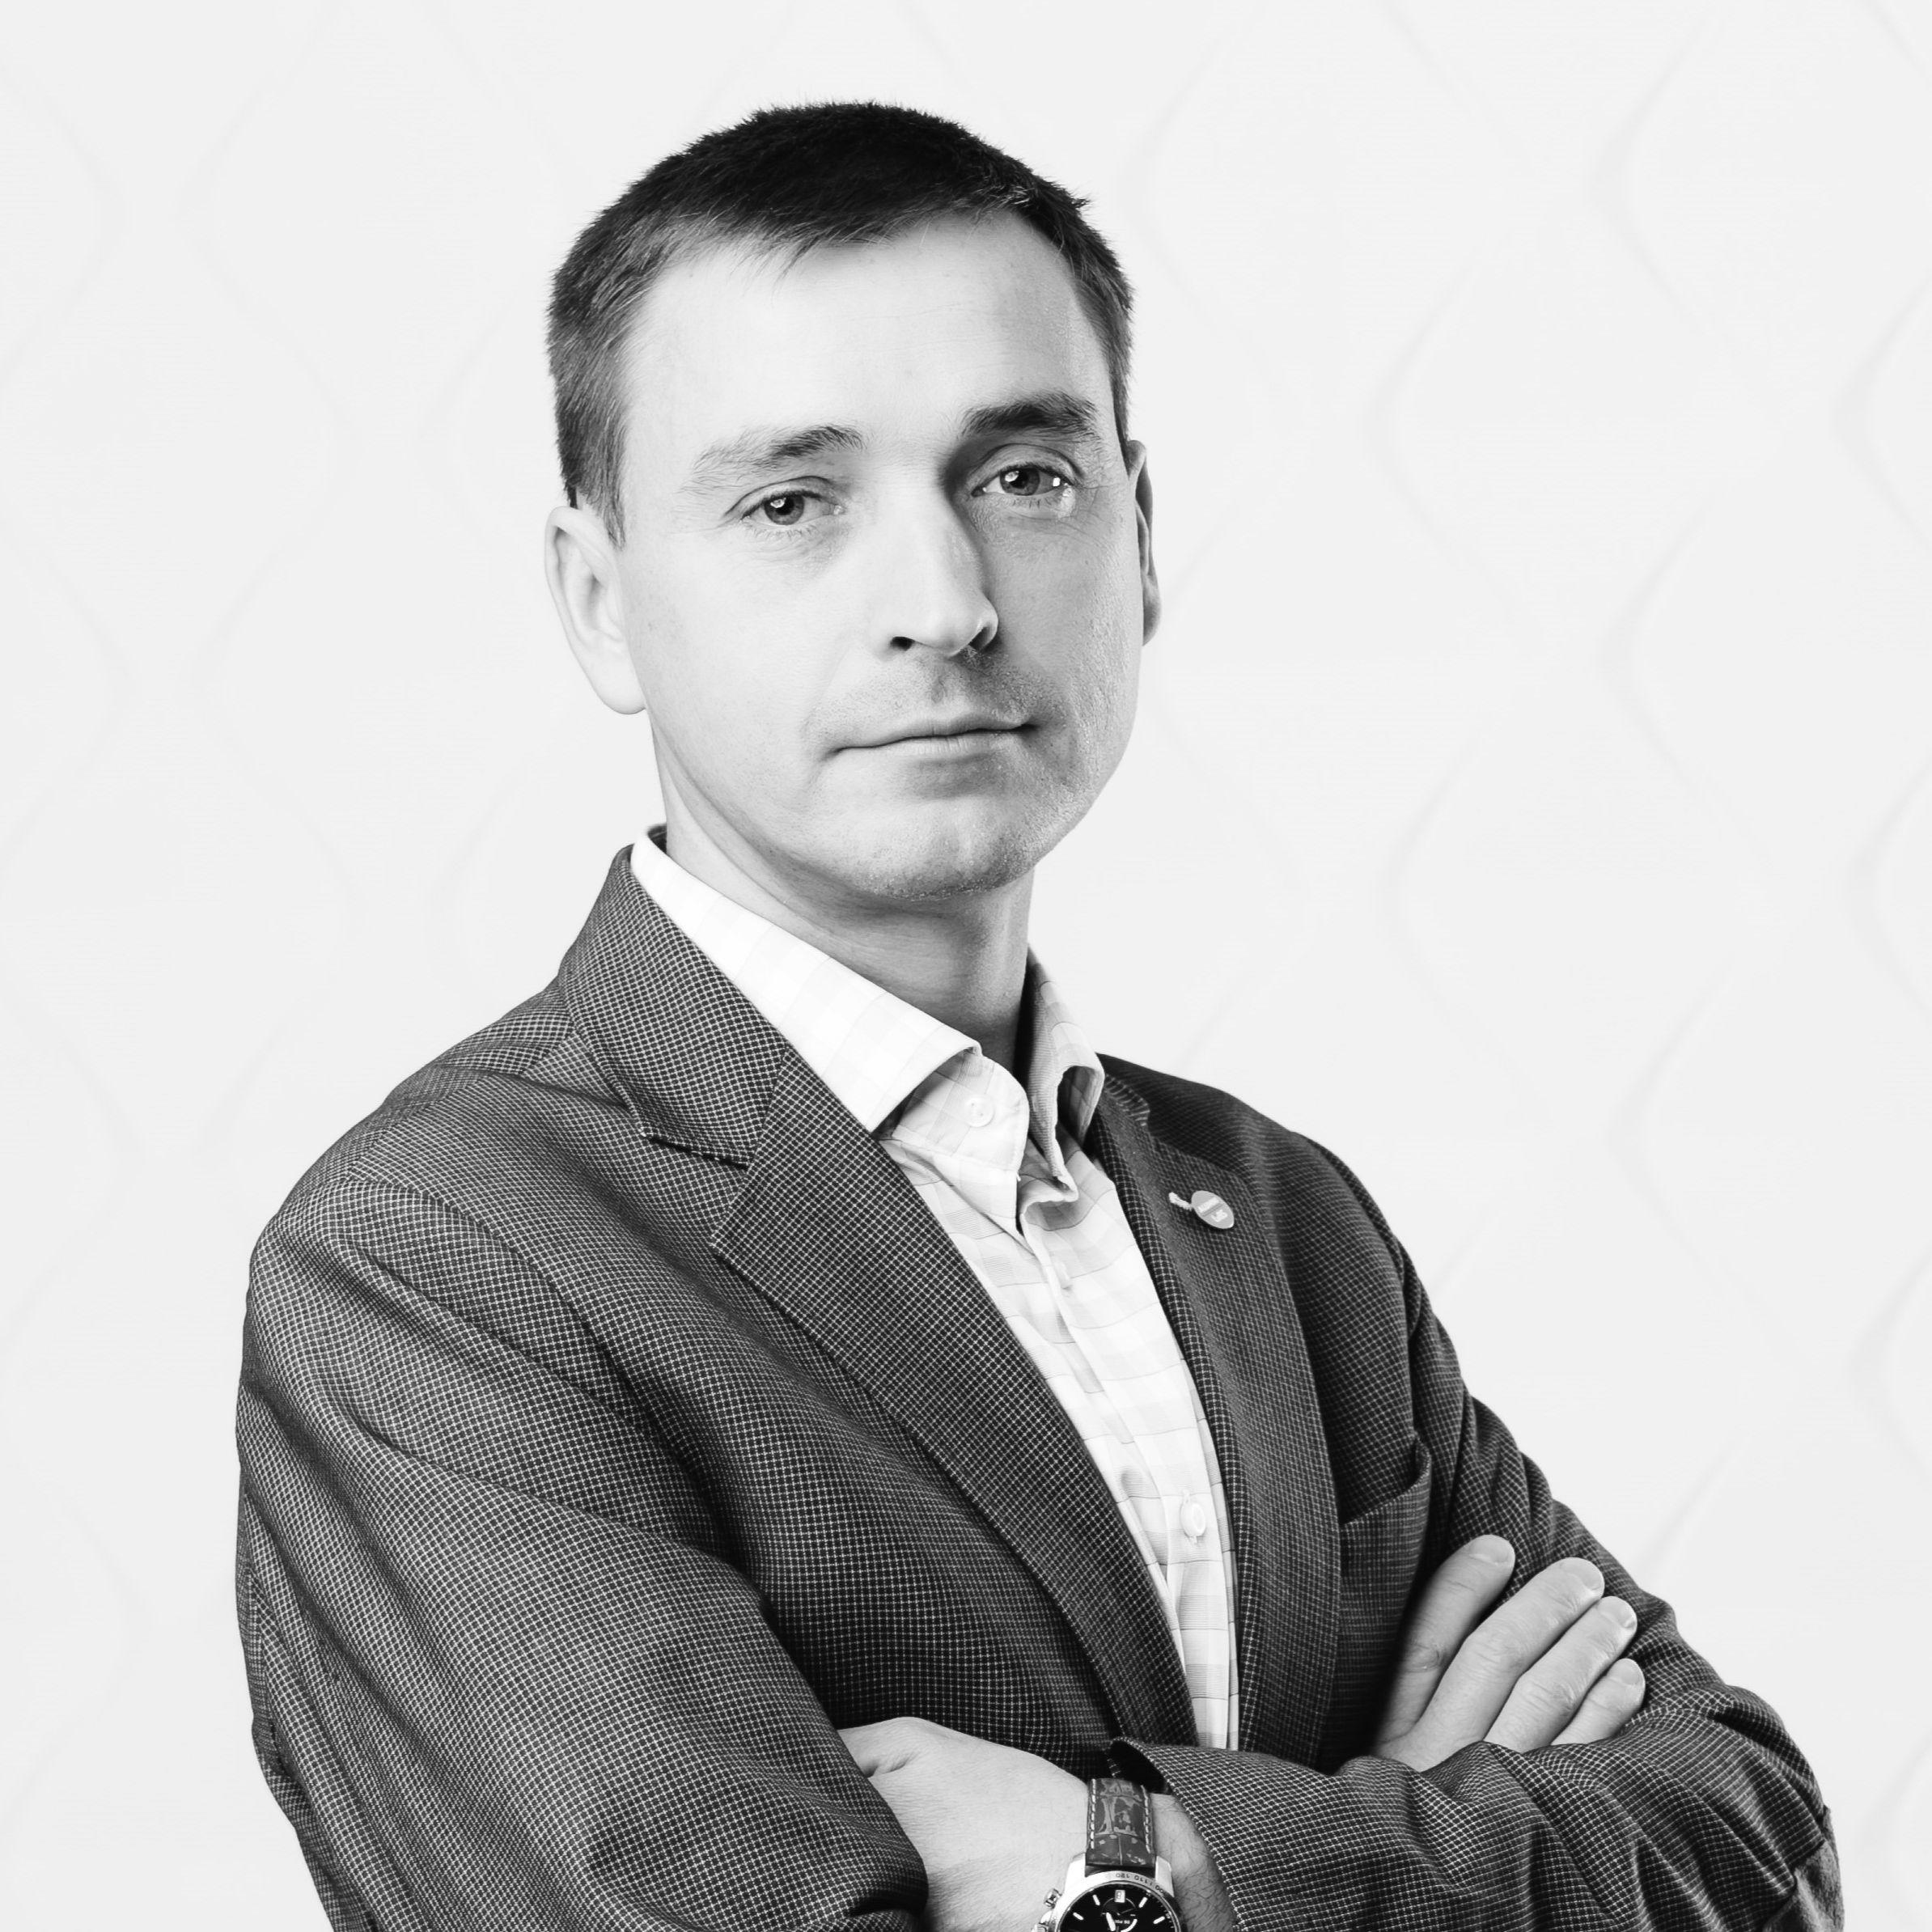 Serhiy Kozlov